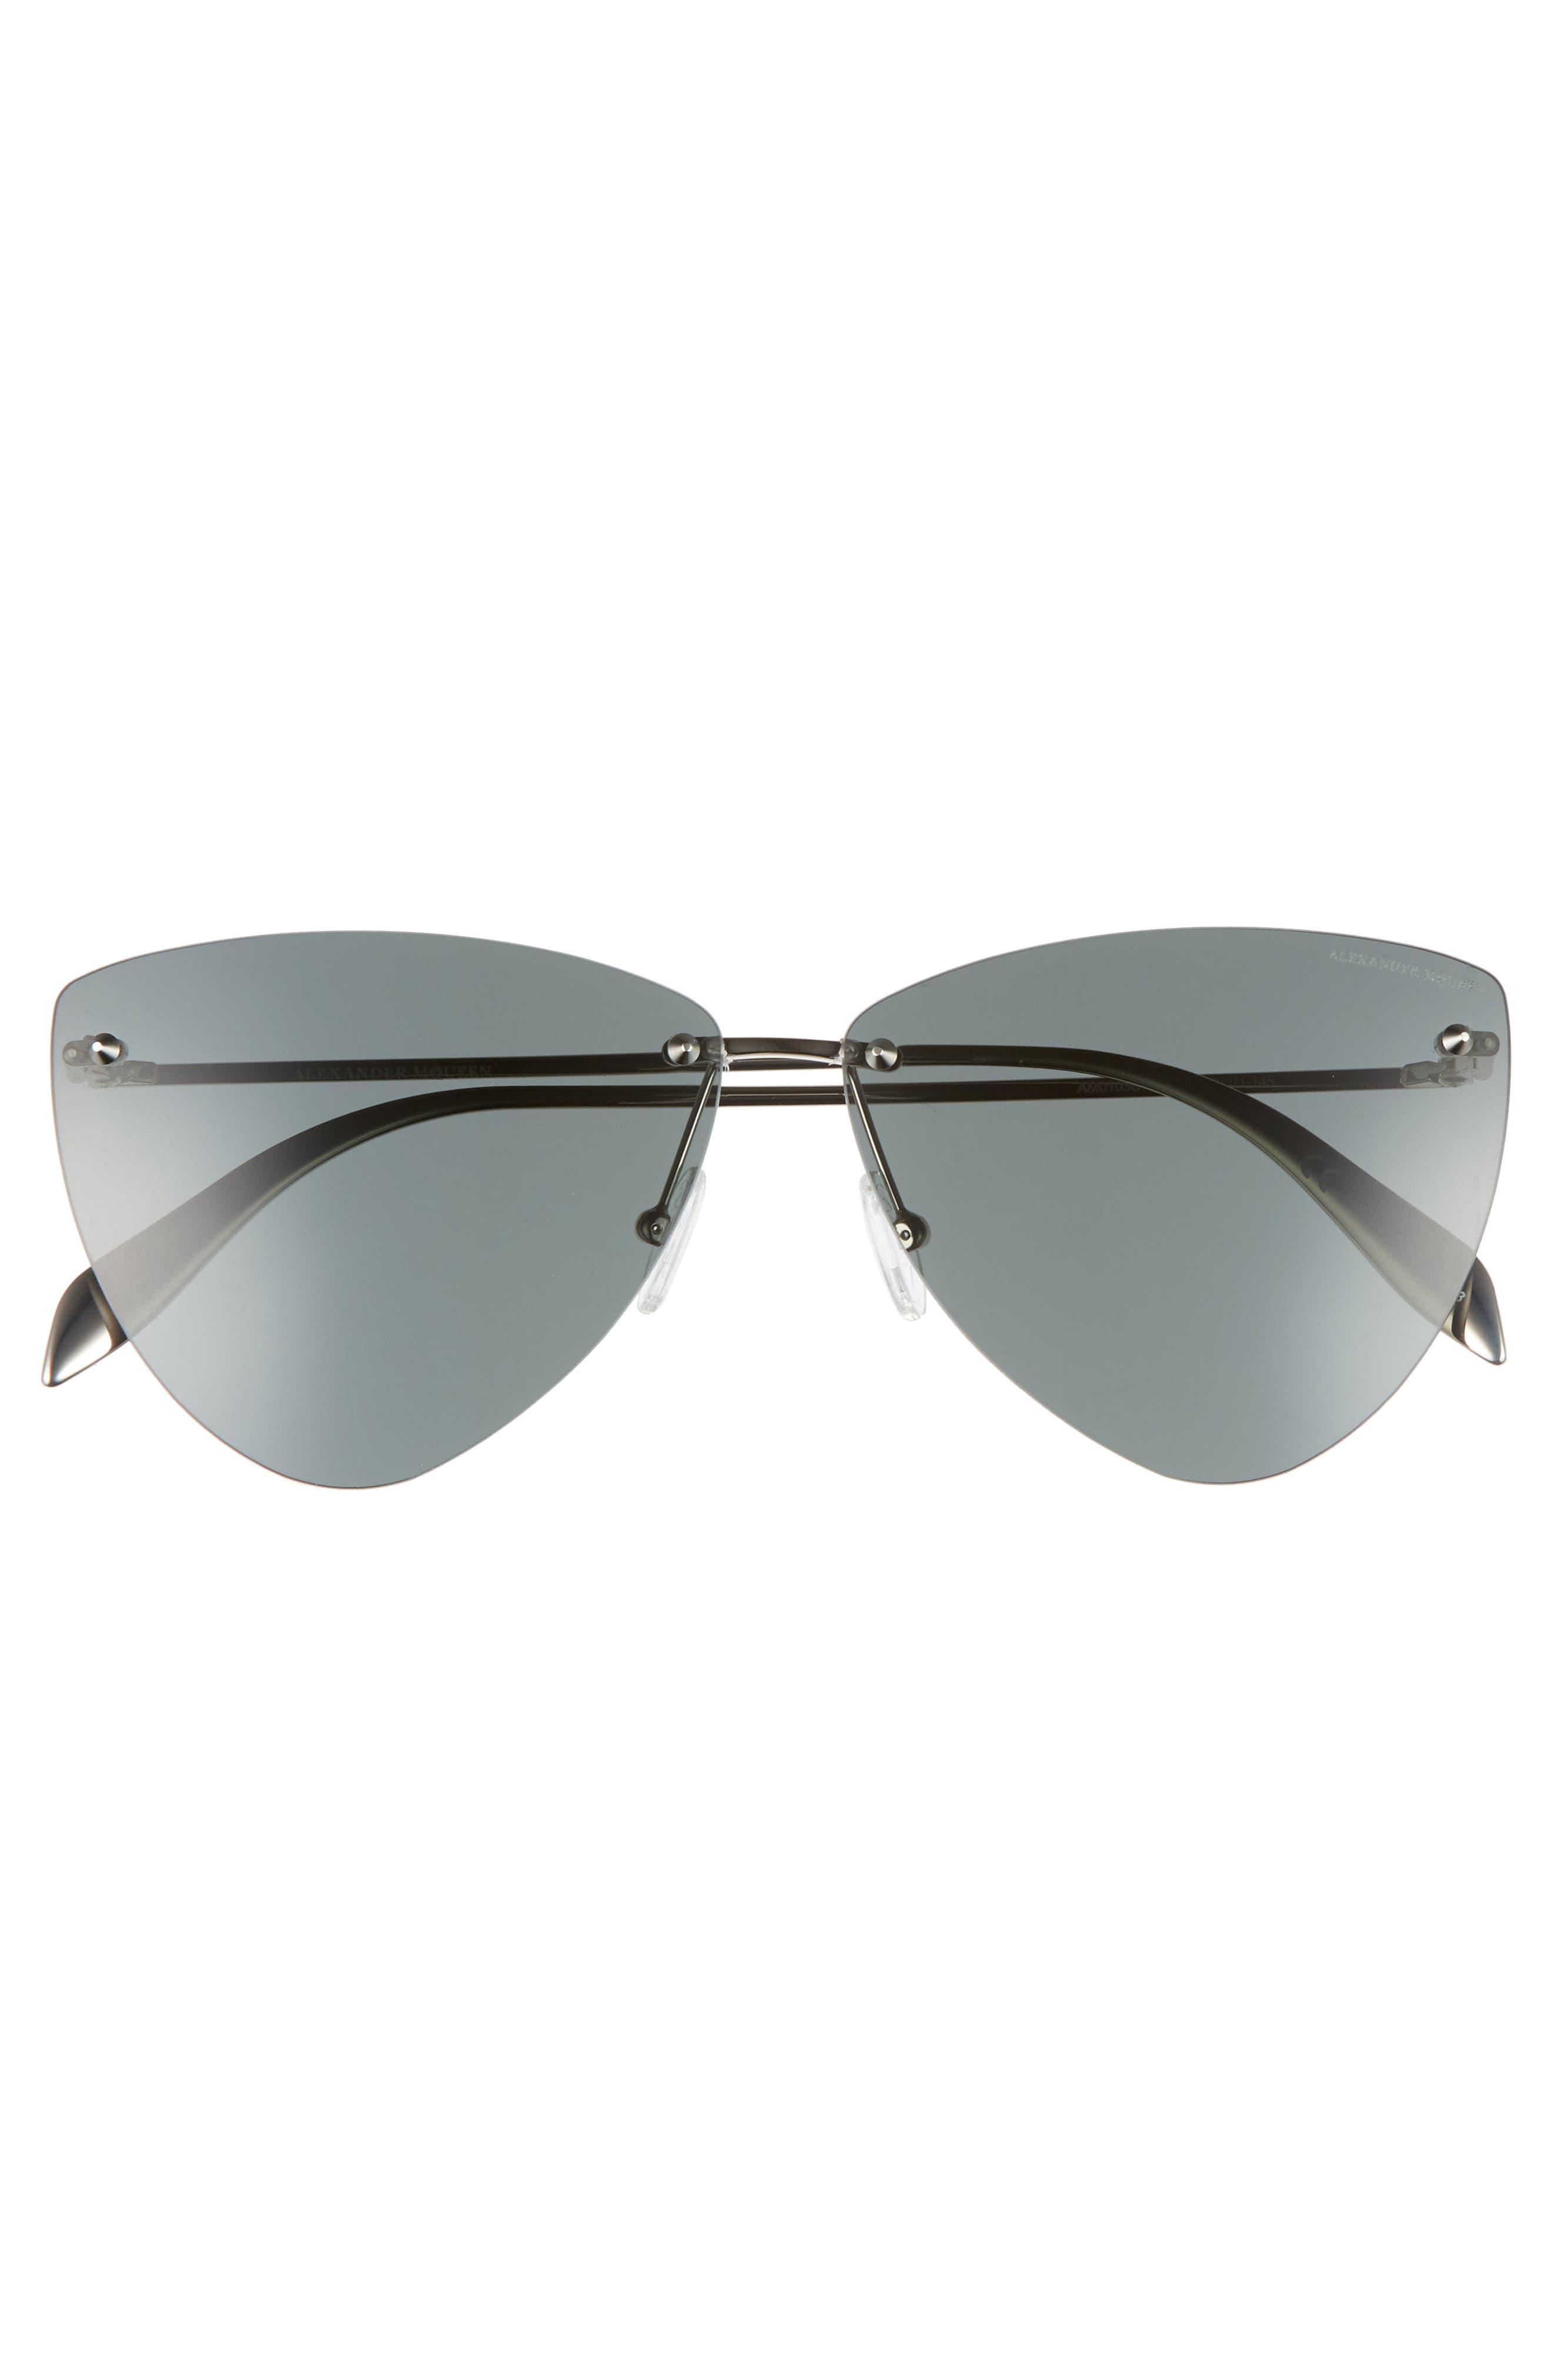 63mm Oversize Rimless Sunglasses,                             Alternate thumbnail 3, color,                             SILVER